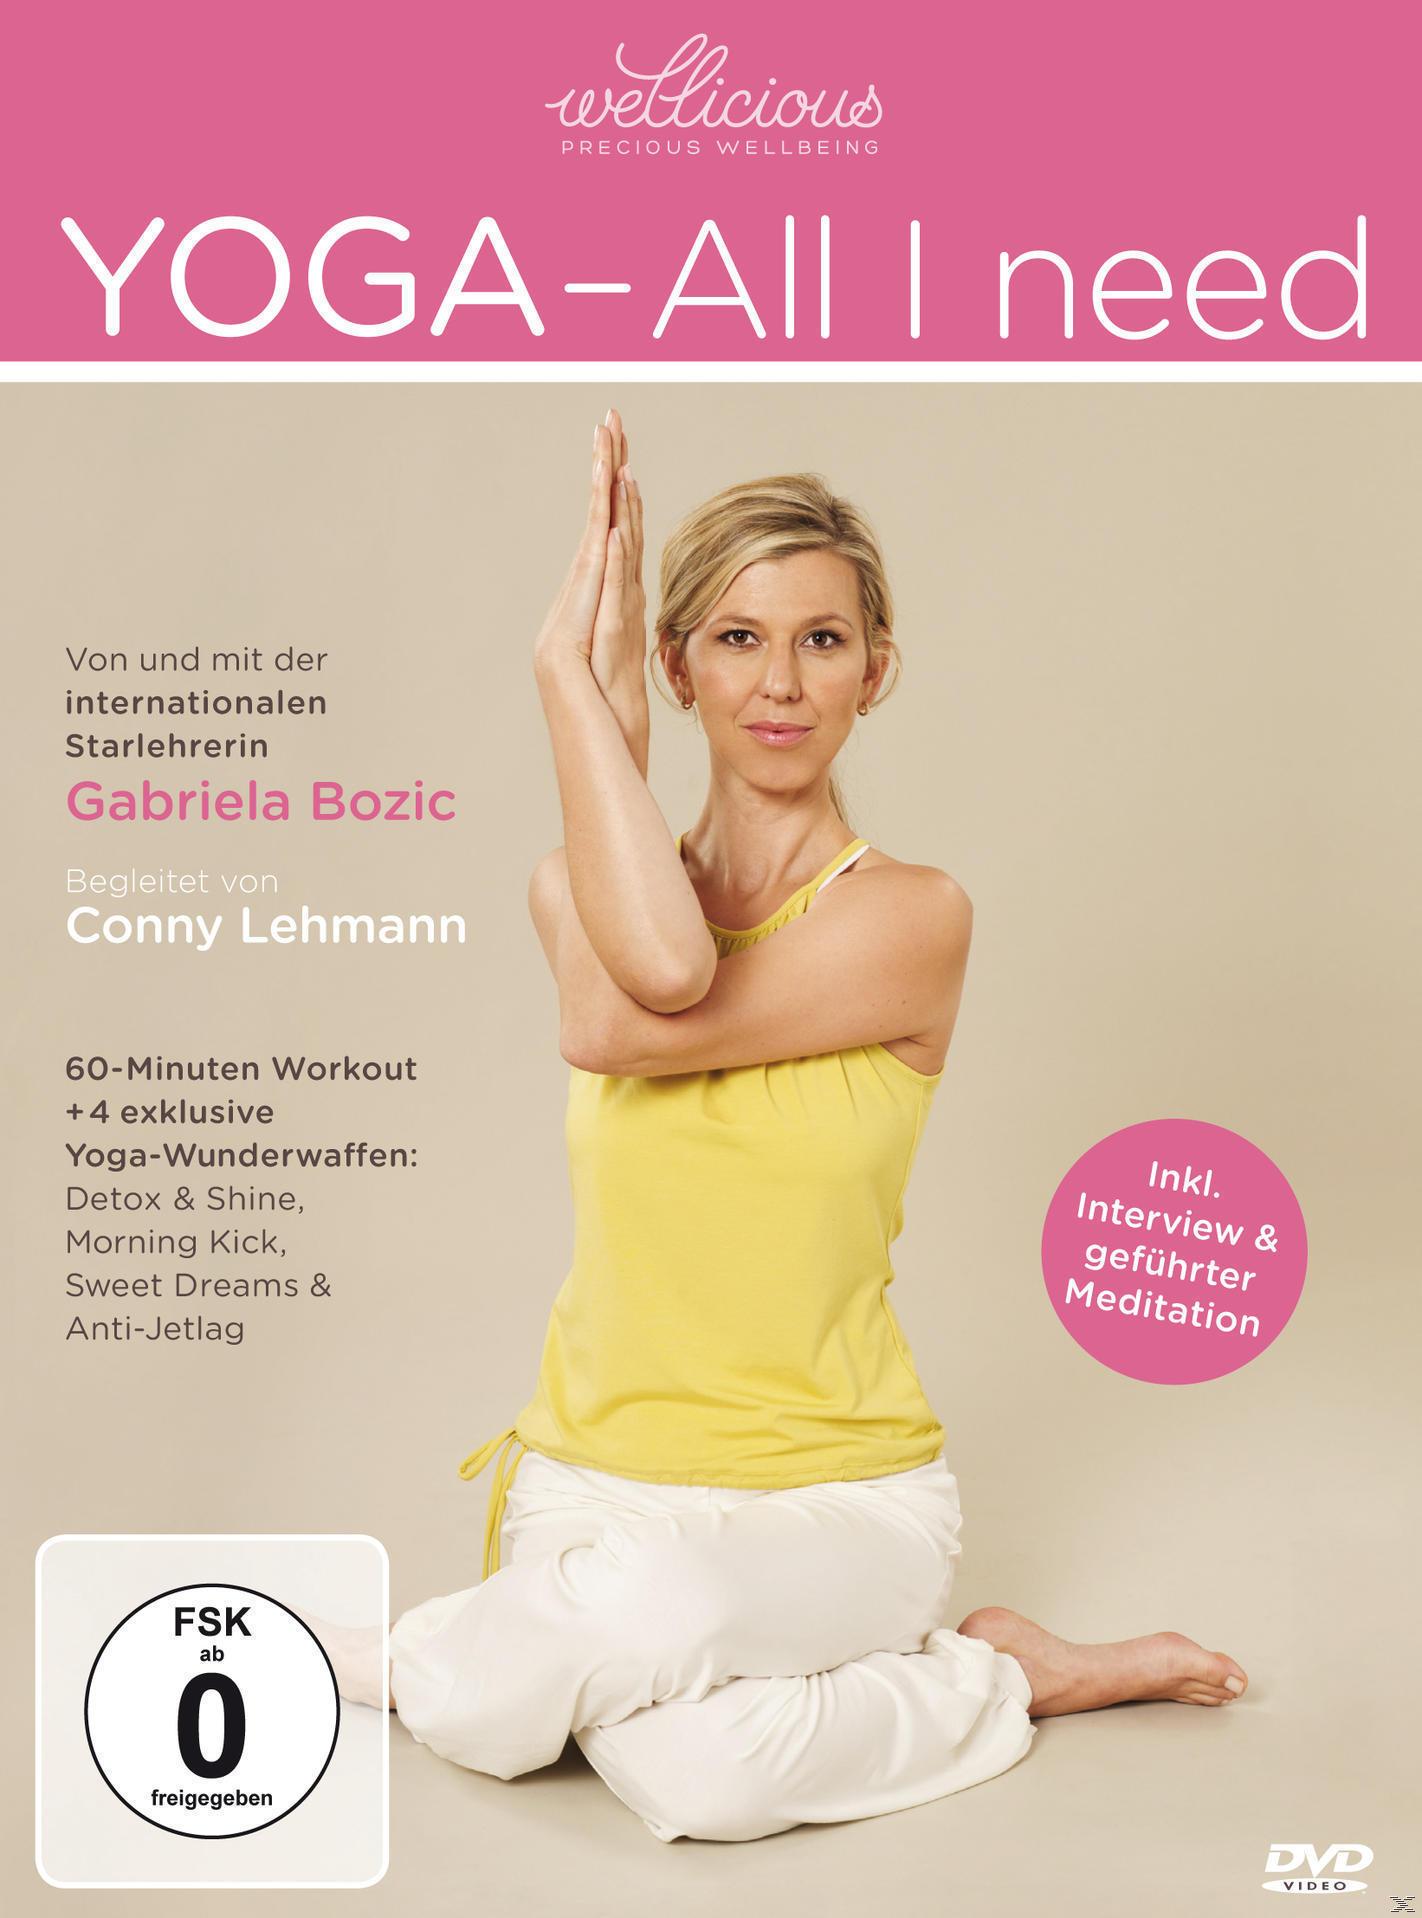 Yoga - All I Need. - presented by wellicious (DVD) für 16,99 Euro